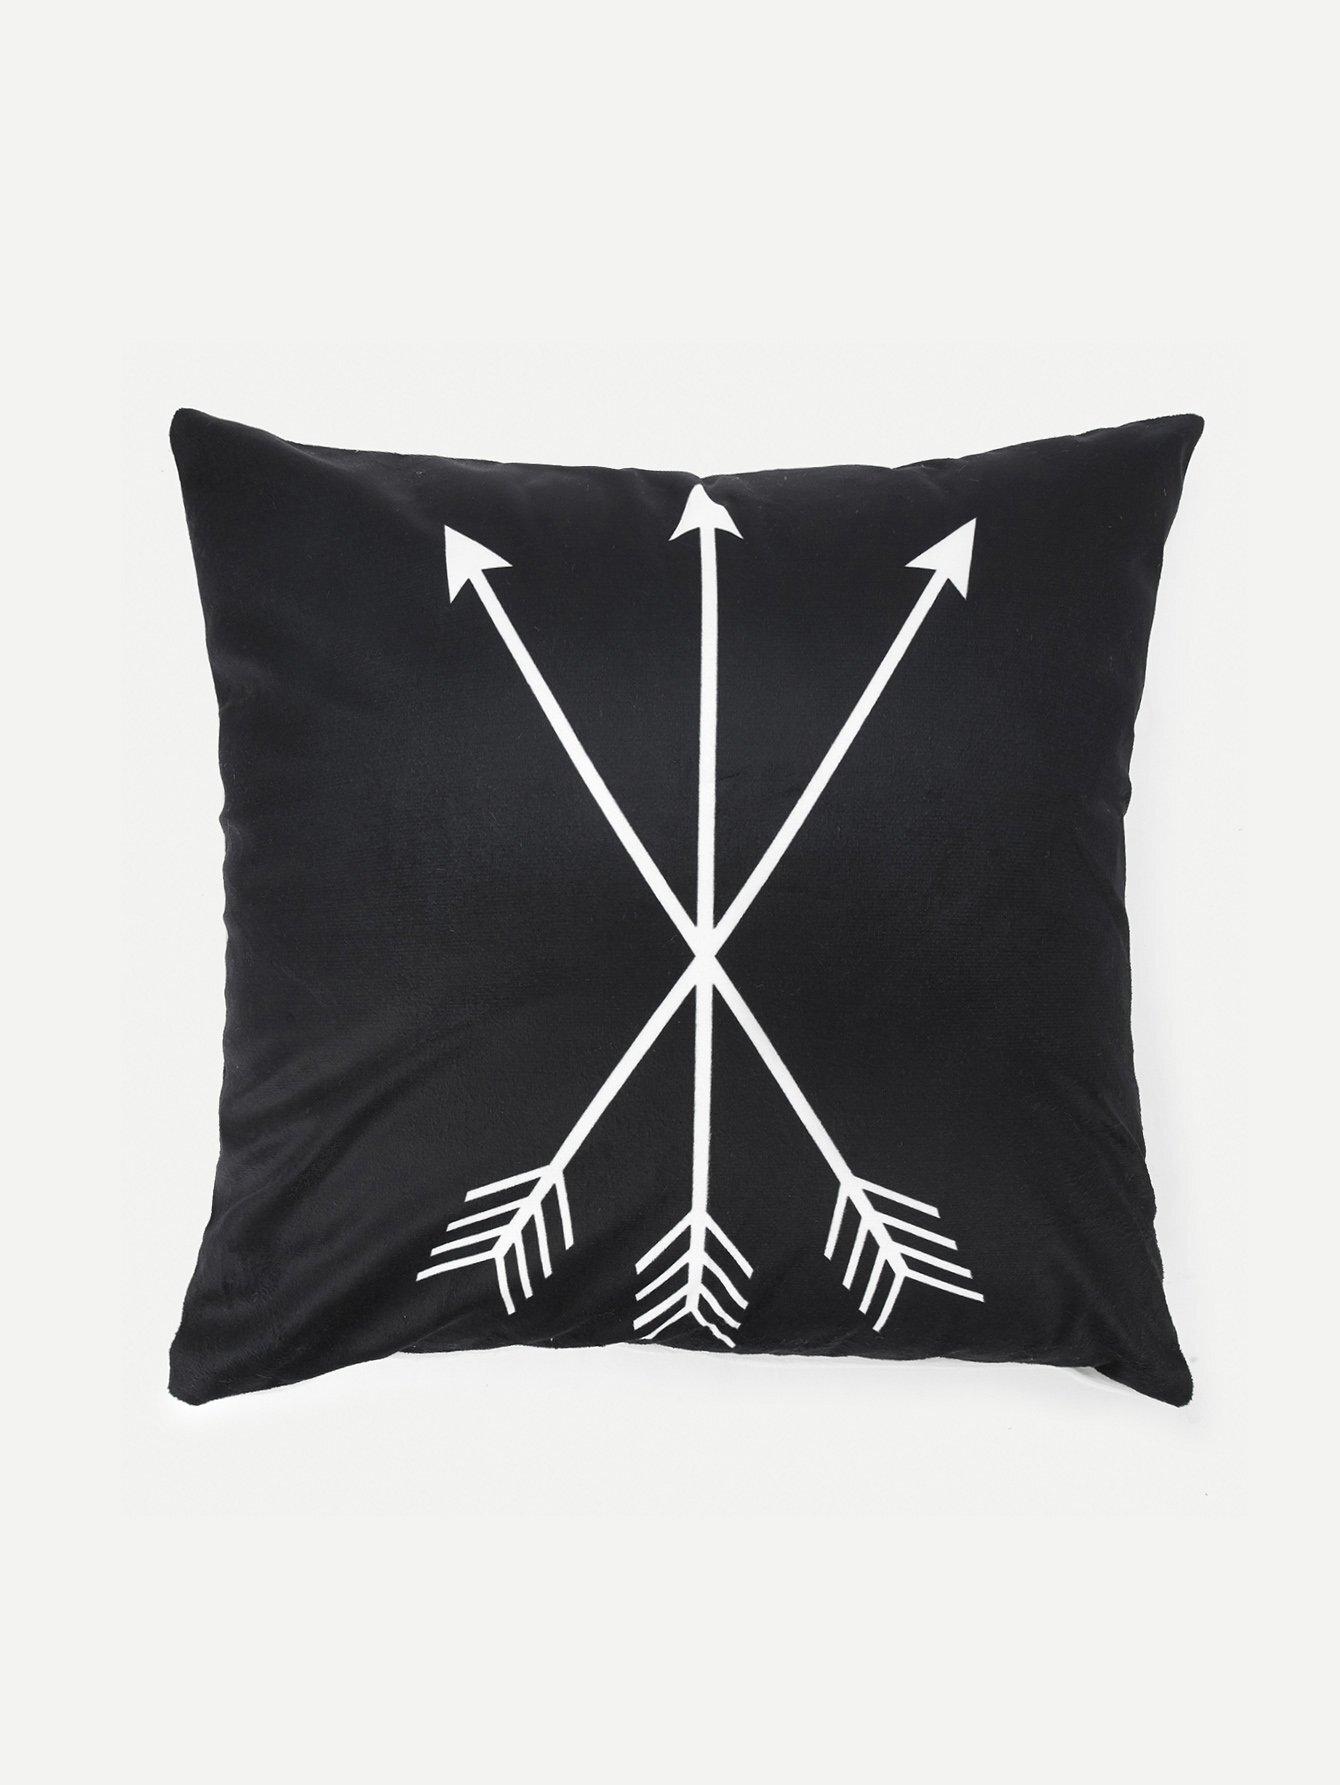 Arrow Print Pillowcase Cover 1PC